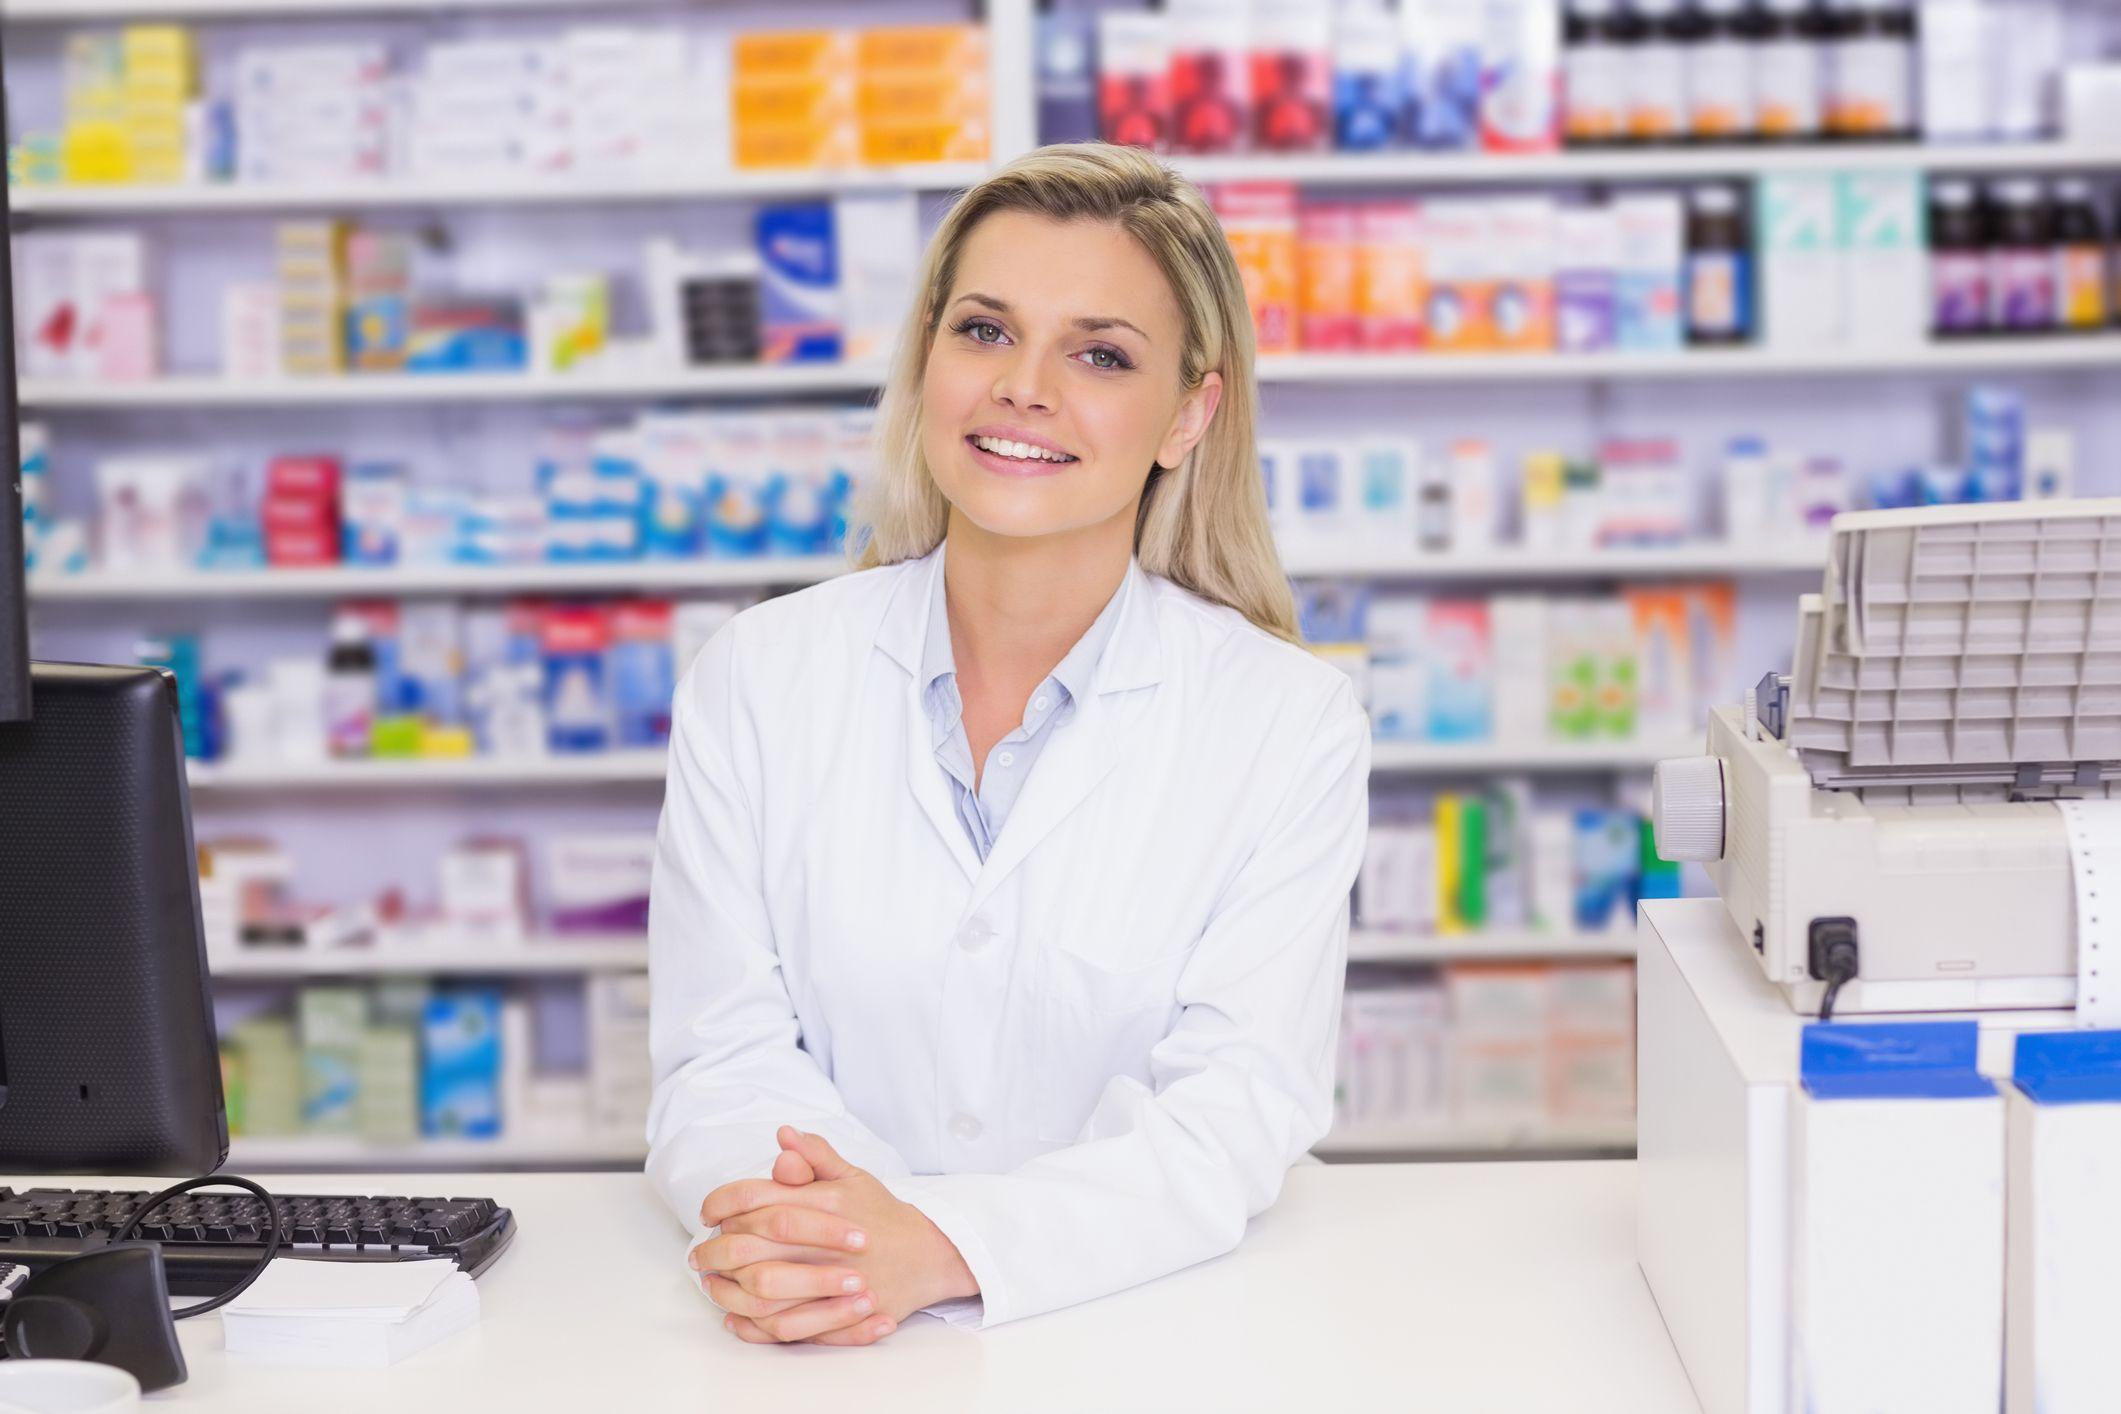 Welcome to Delmarva Pharmacy